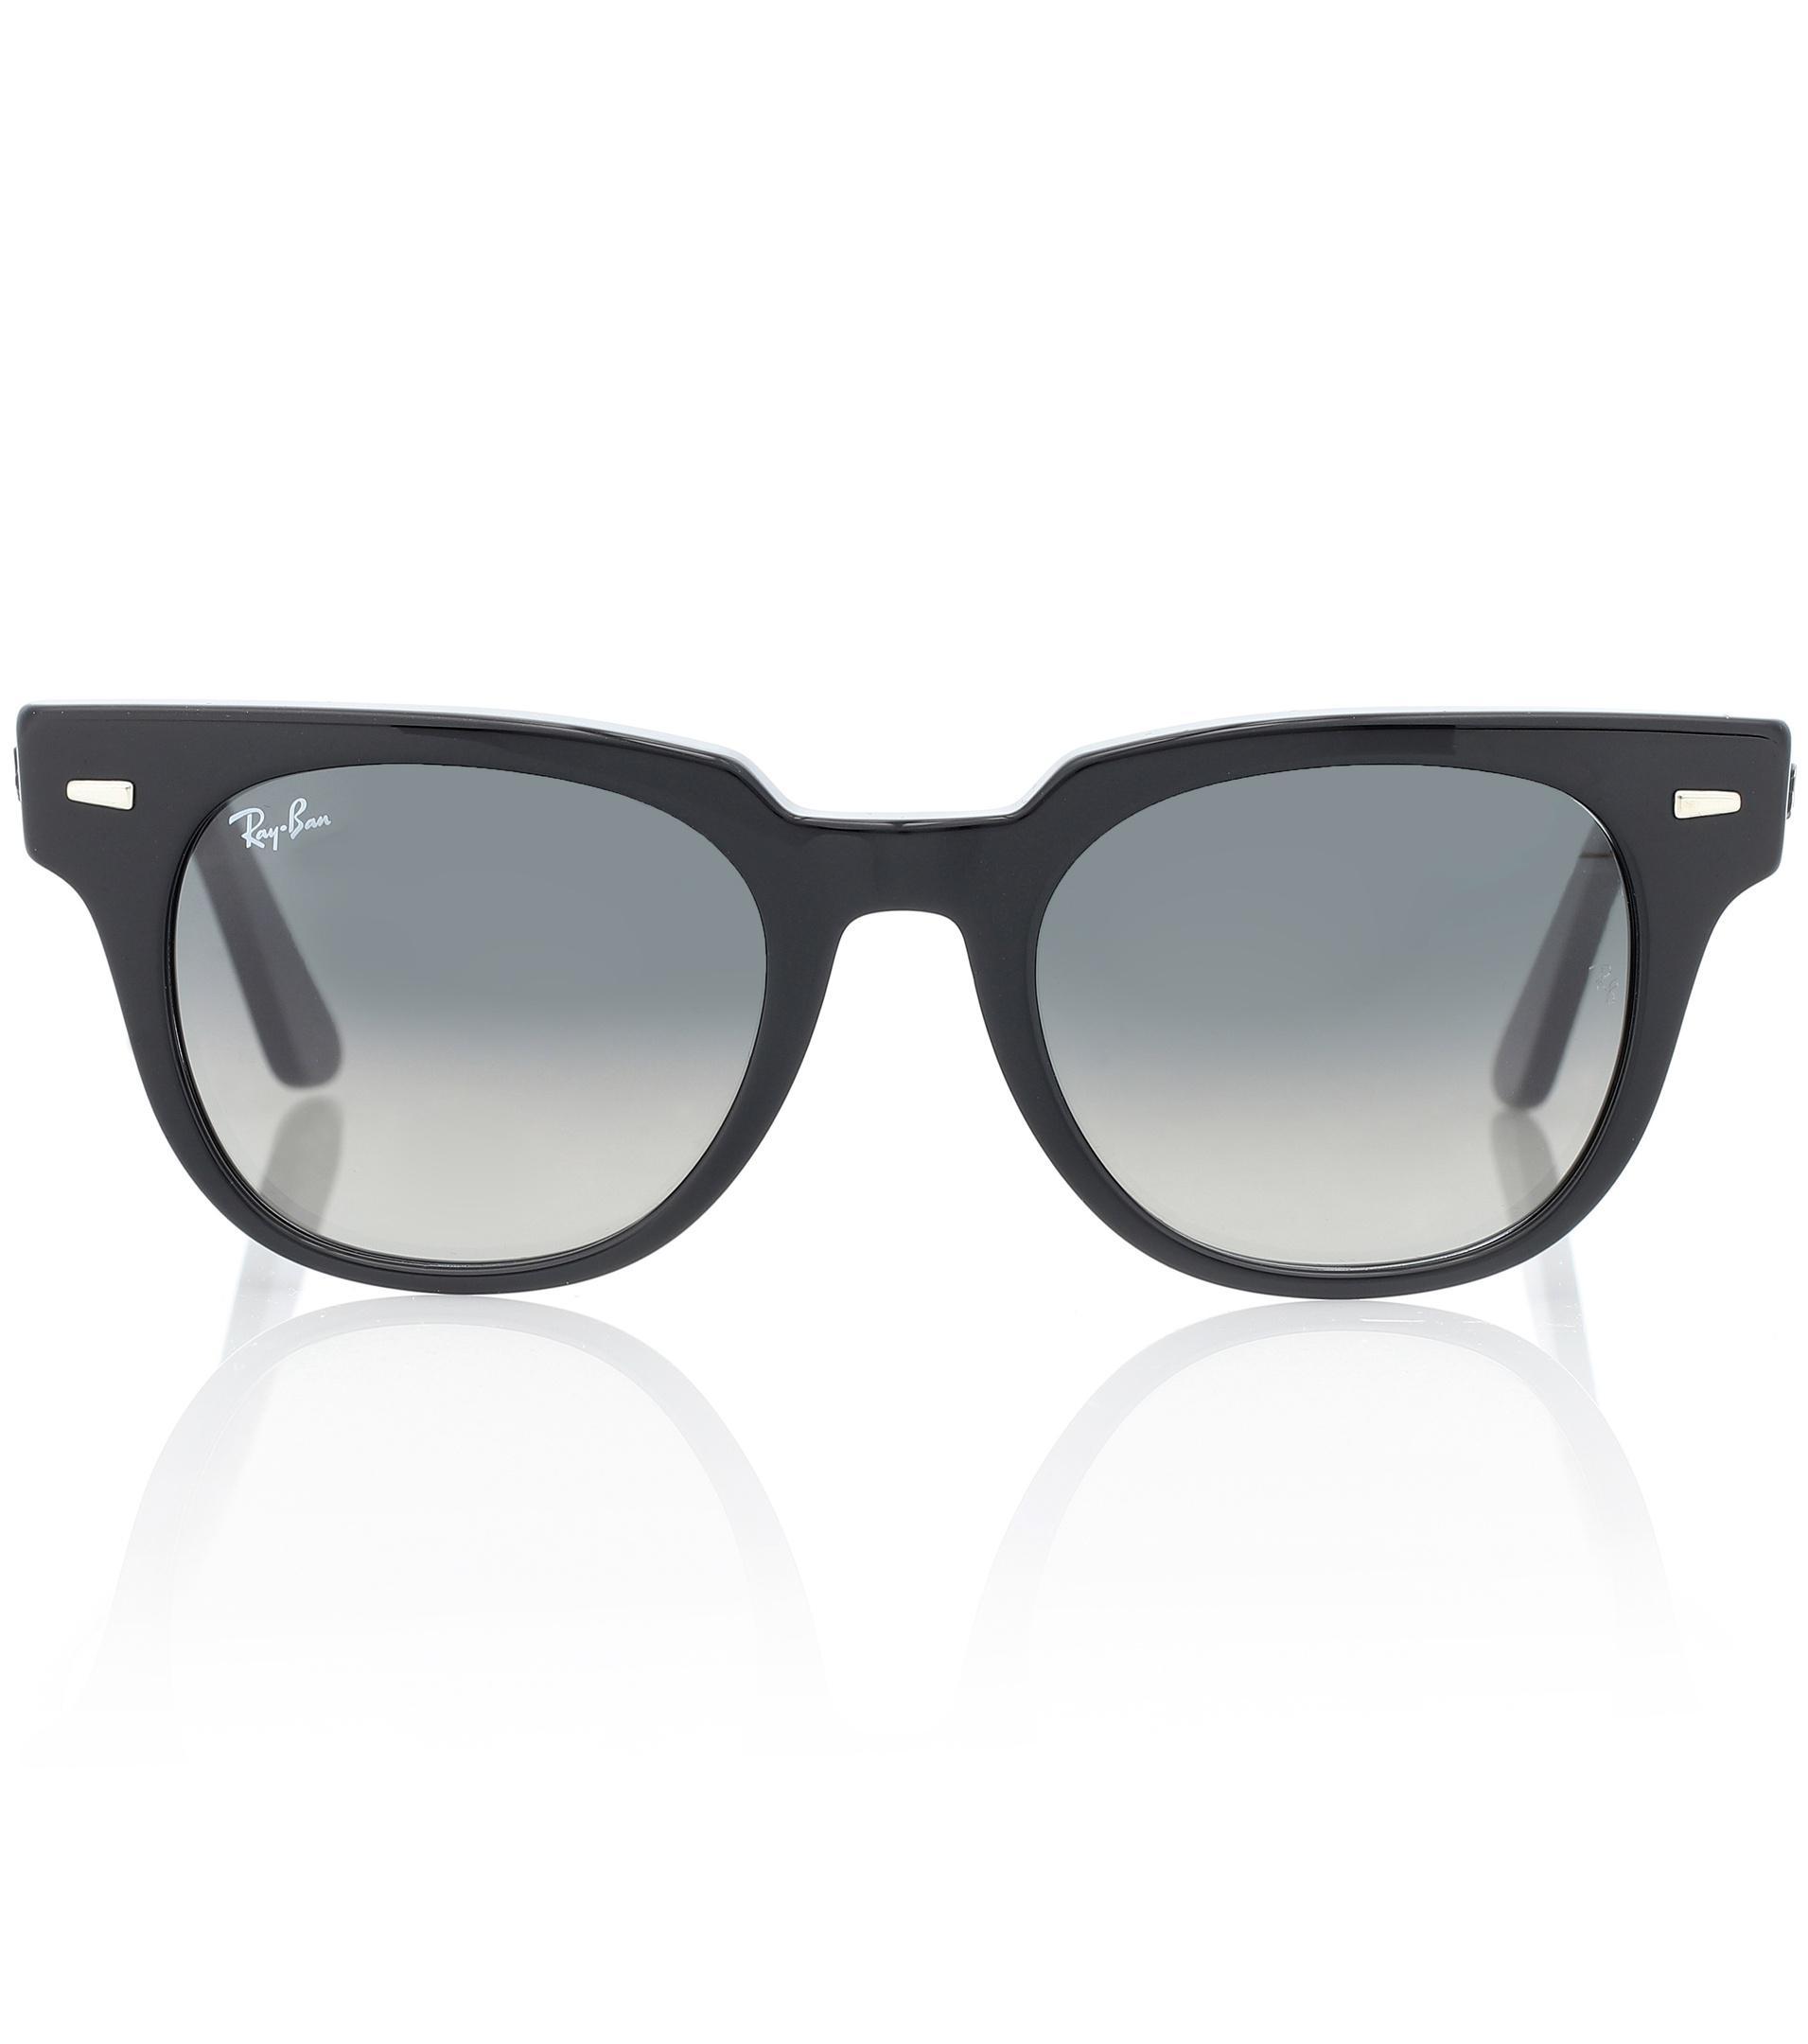 f58fba665de Ray-Ban Classic Wayfarer Sunglasses in Black - Lyst